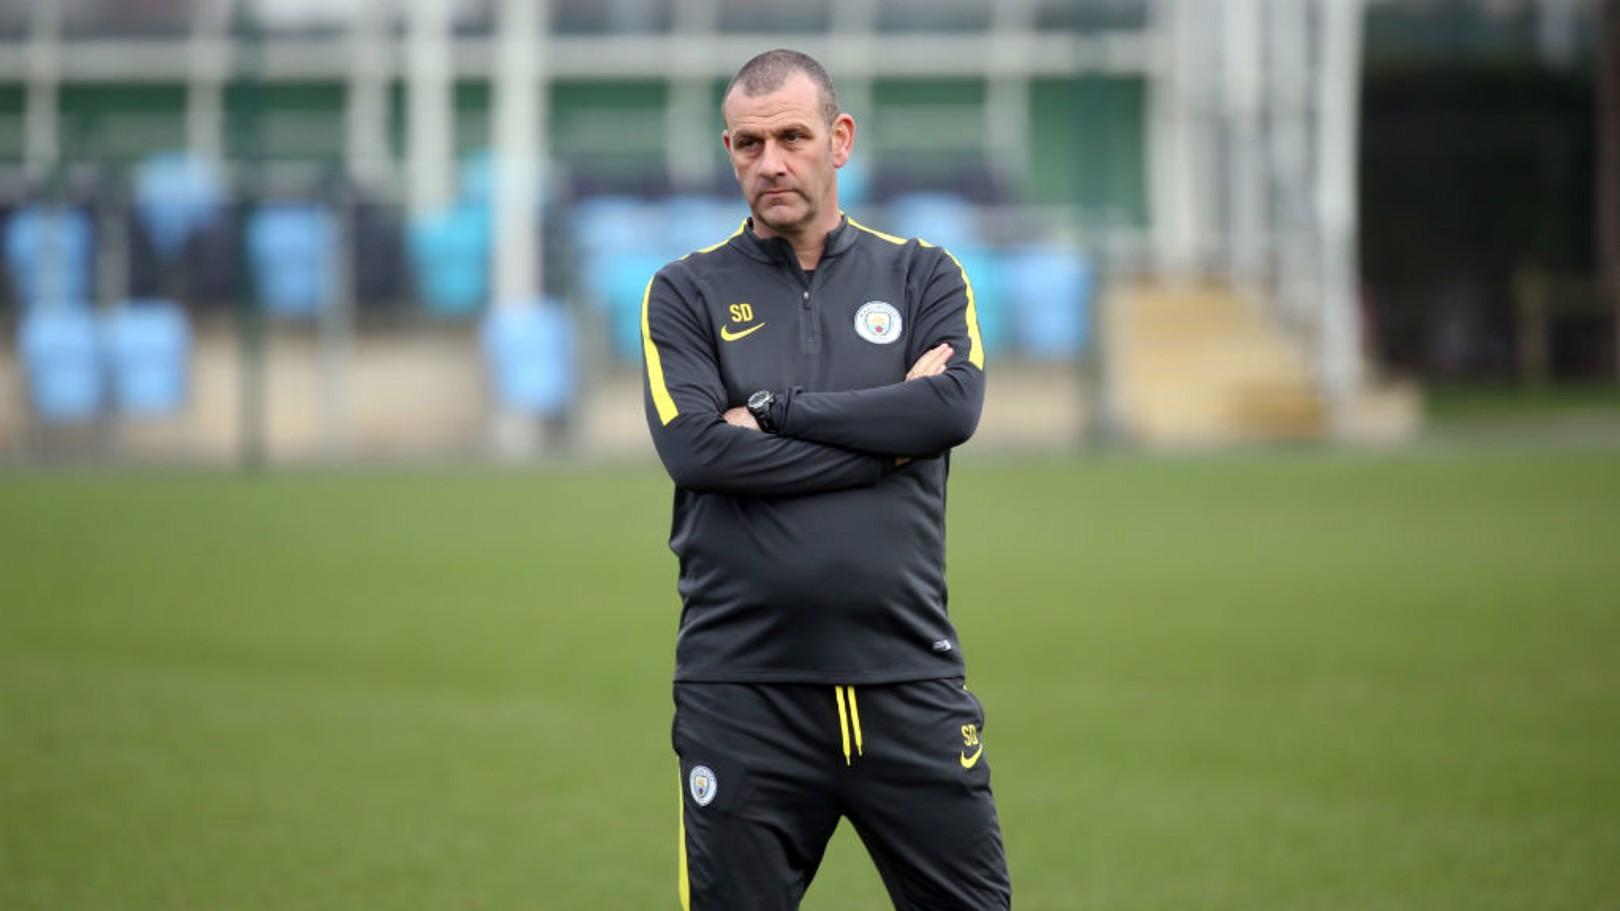 Simon Davies joins Vincent Kompany at Anderlecht